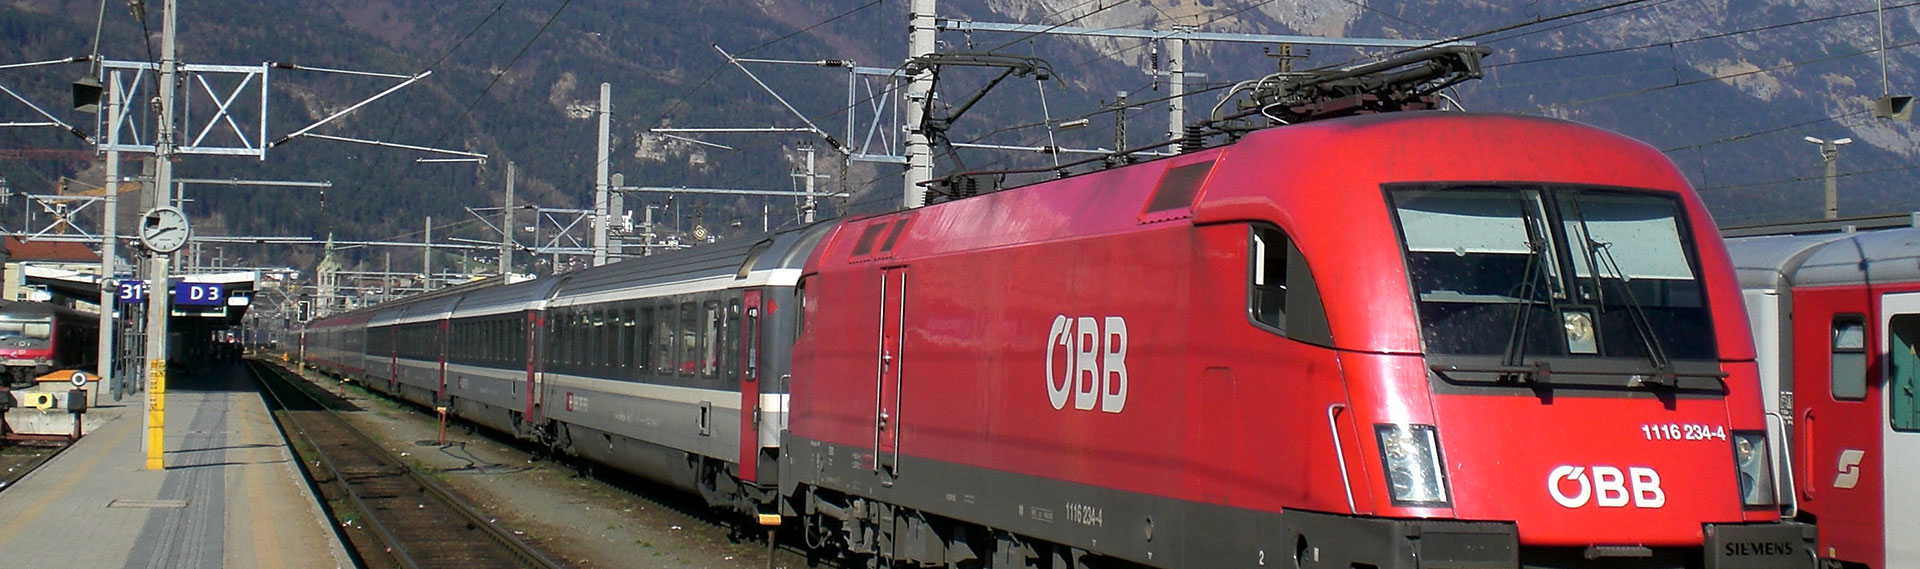 Austria-OBB-EuroCity-leaving-Innsbruck